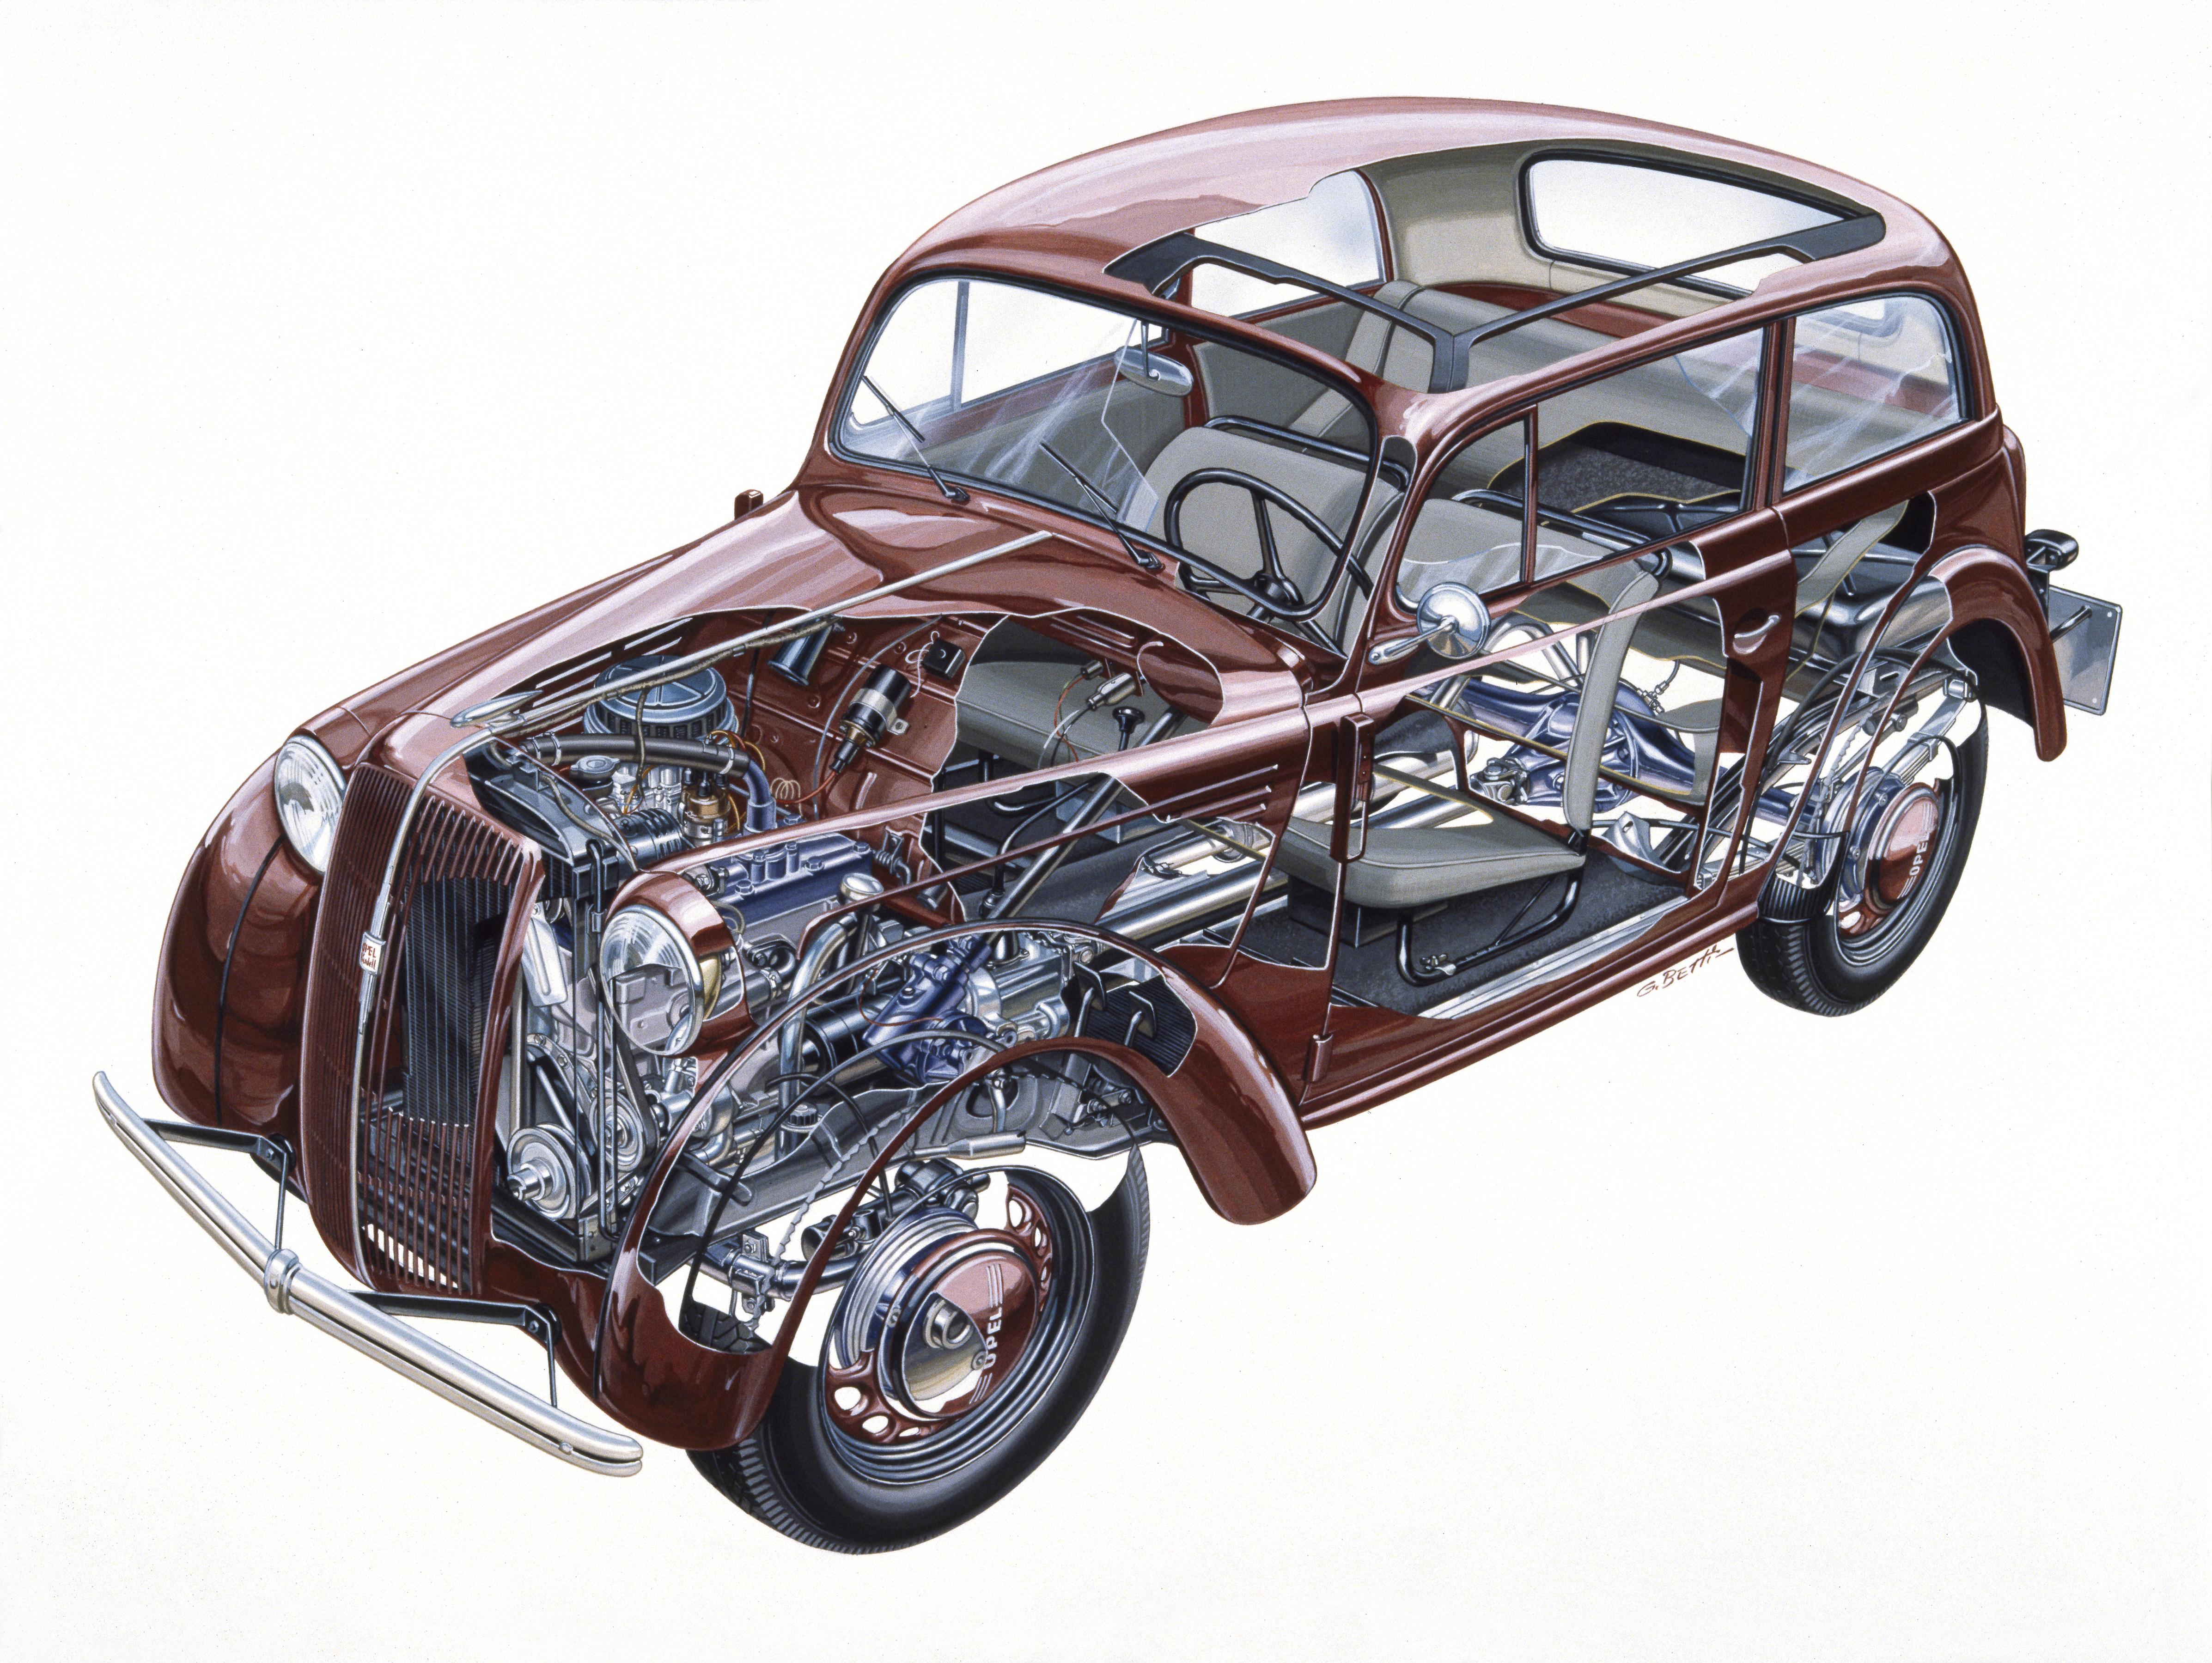 Opel Kadett '37 1937 - 1940 Sedan #4